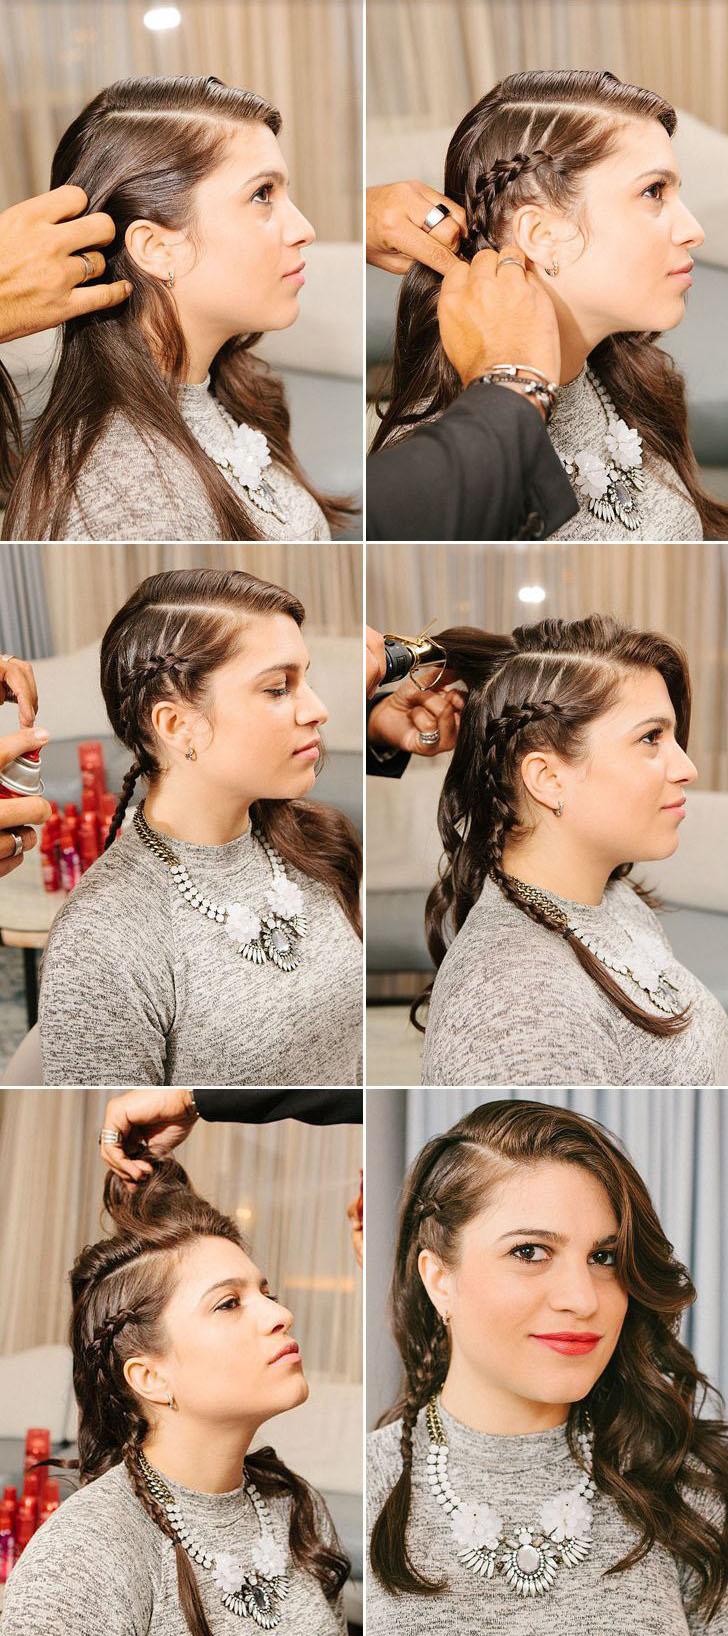 Faux undercut style side braids strayhair faux undercut braided hairstyle diy how to solutioingenieria Choice Image